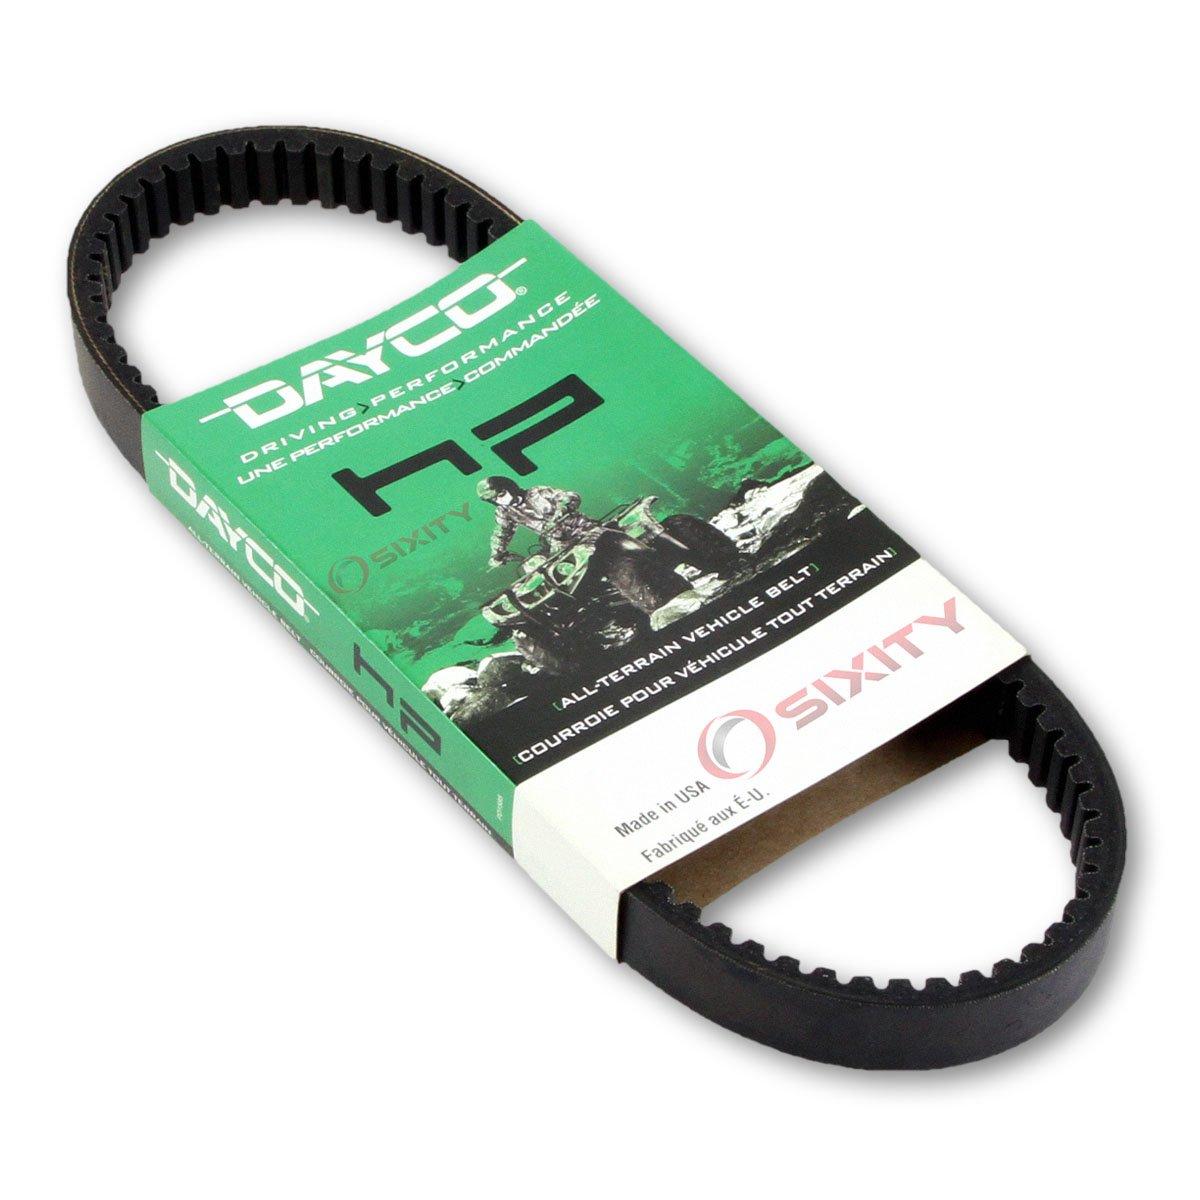 2005-2008 Kawasaki KAF620 Mule 3010 Trans 4x4 Drive Belt Dayco HP ATV OEM Upgrade Replacement Transmission Belts